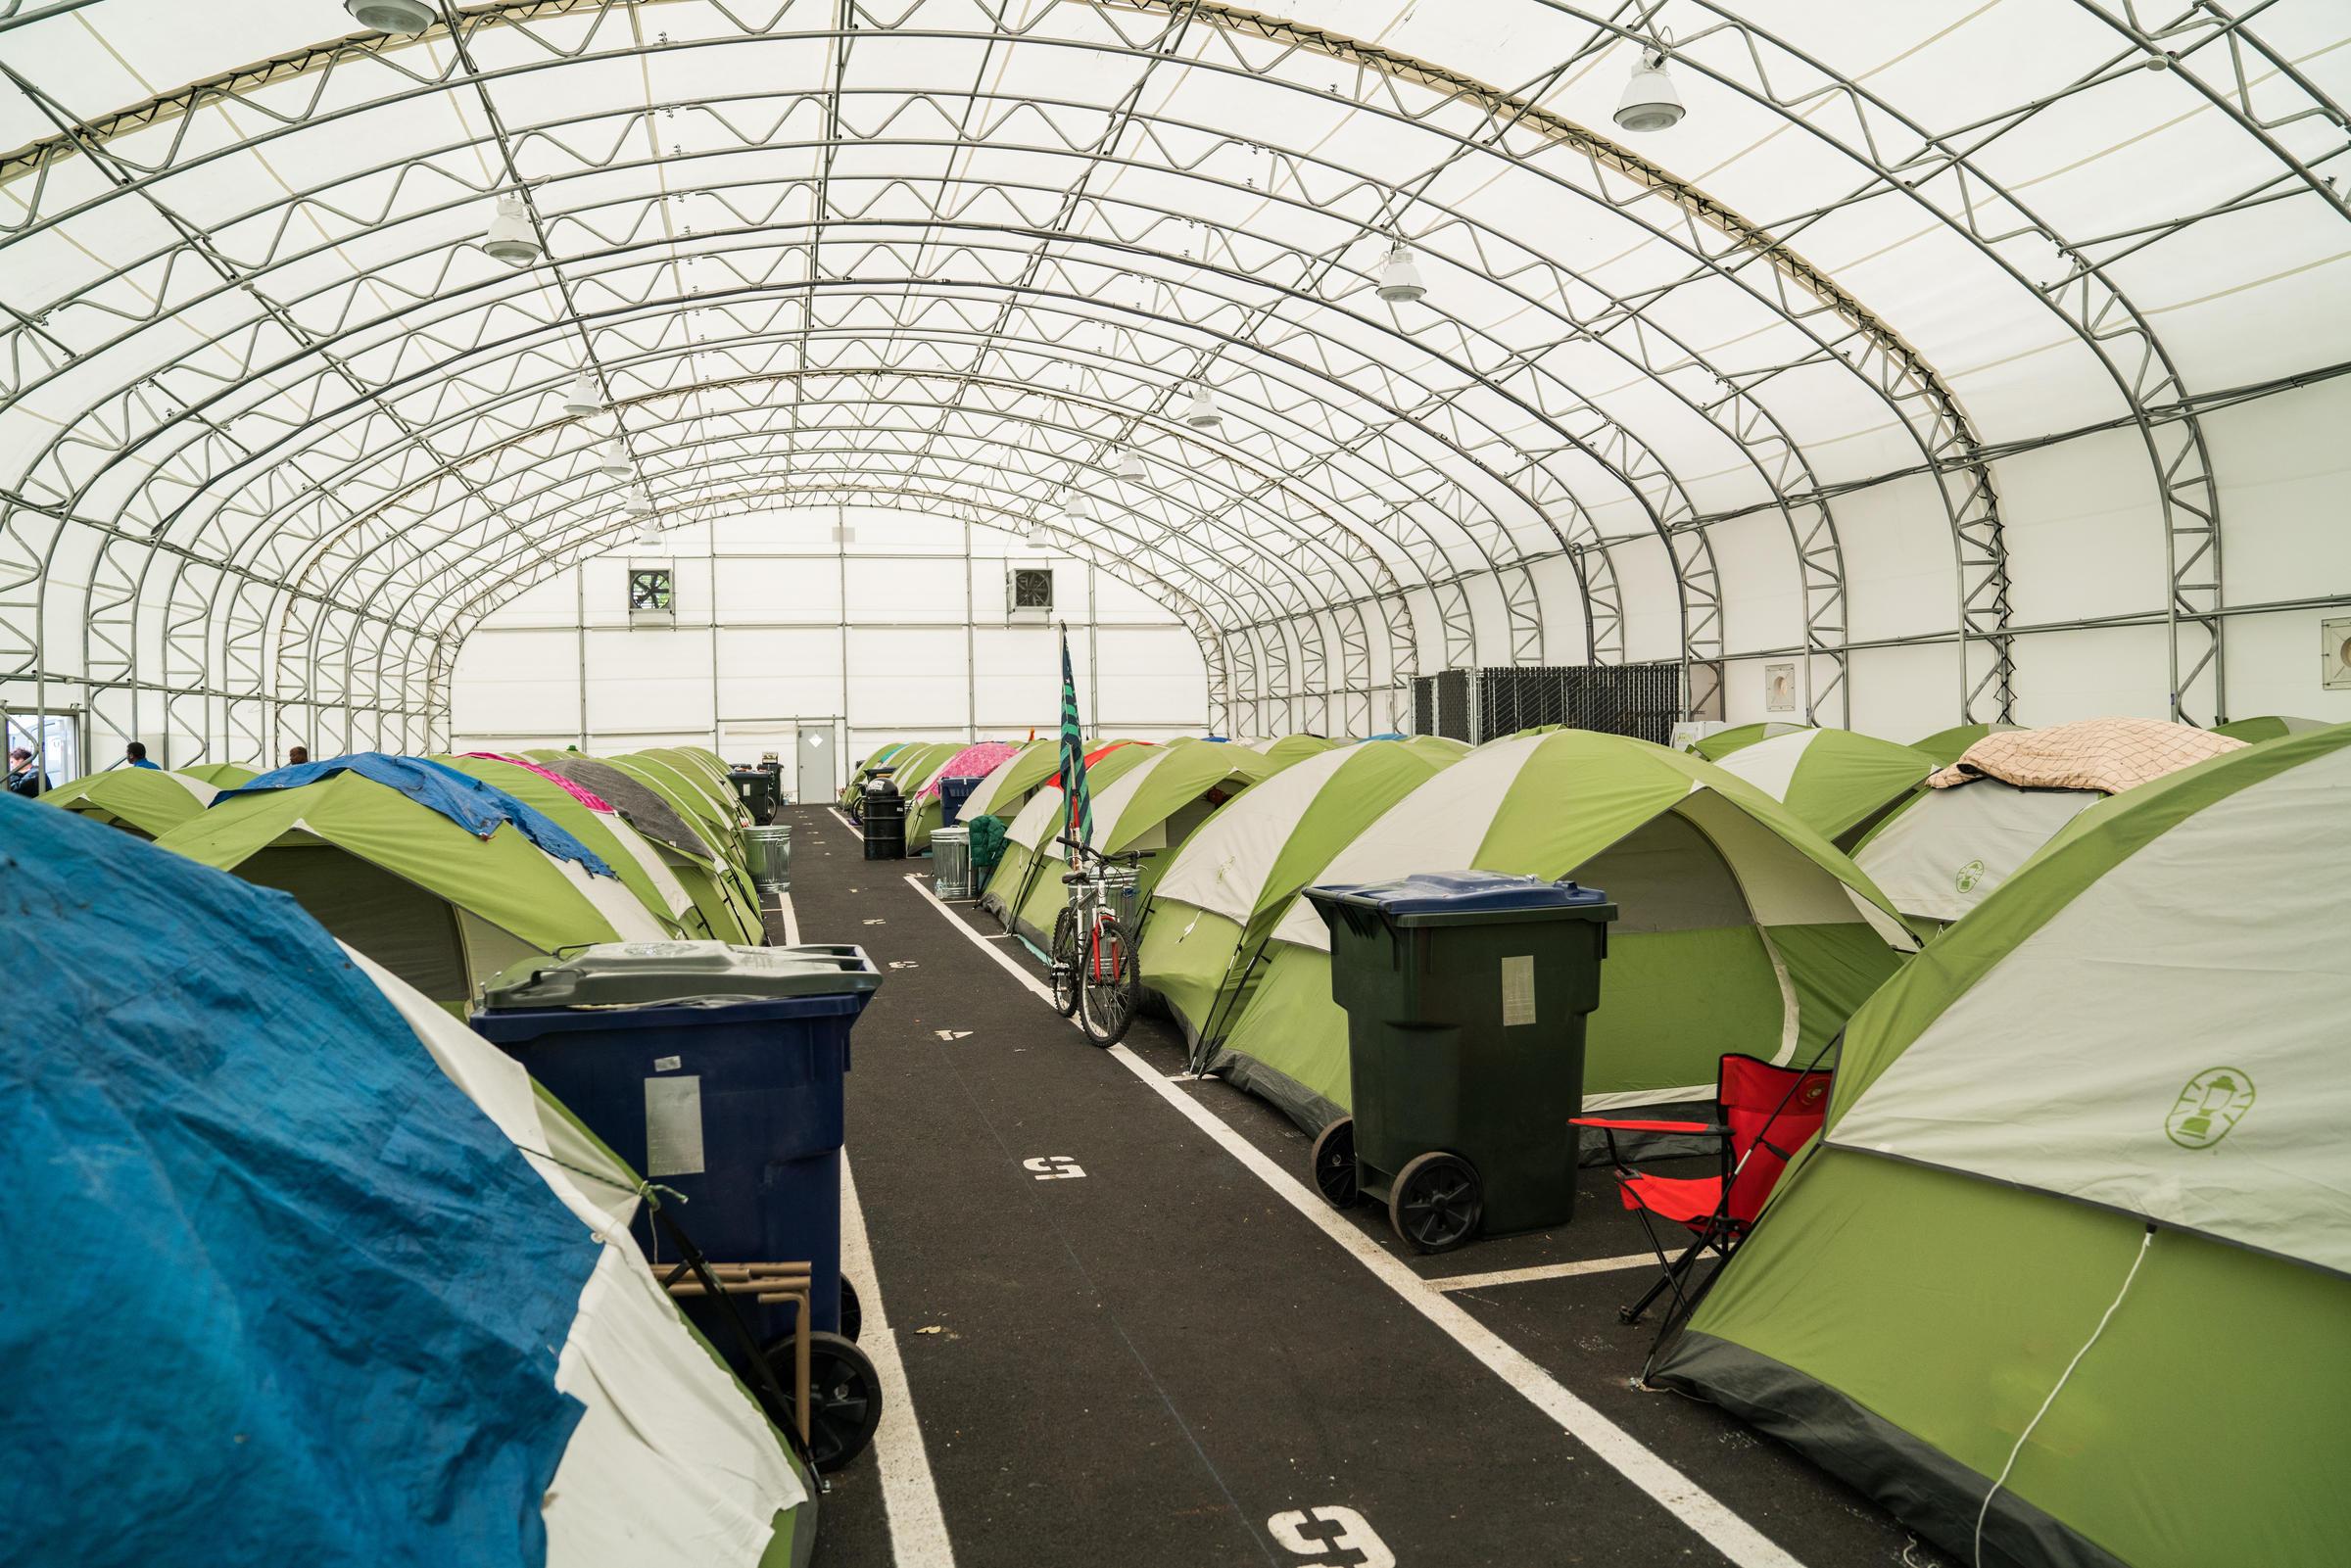 What if we treated homelessness like an earthquake?   KUOW